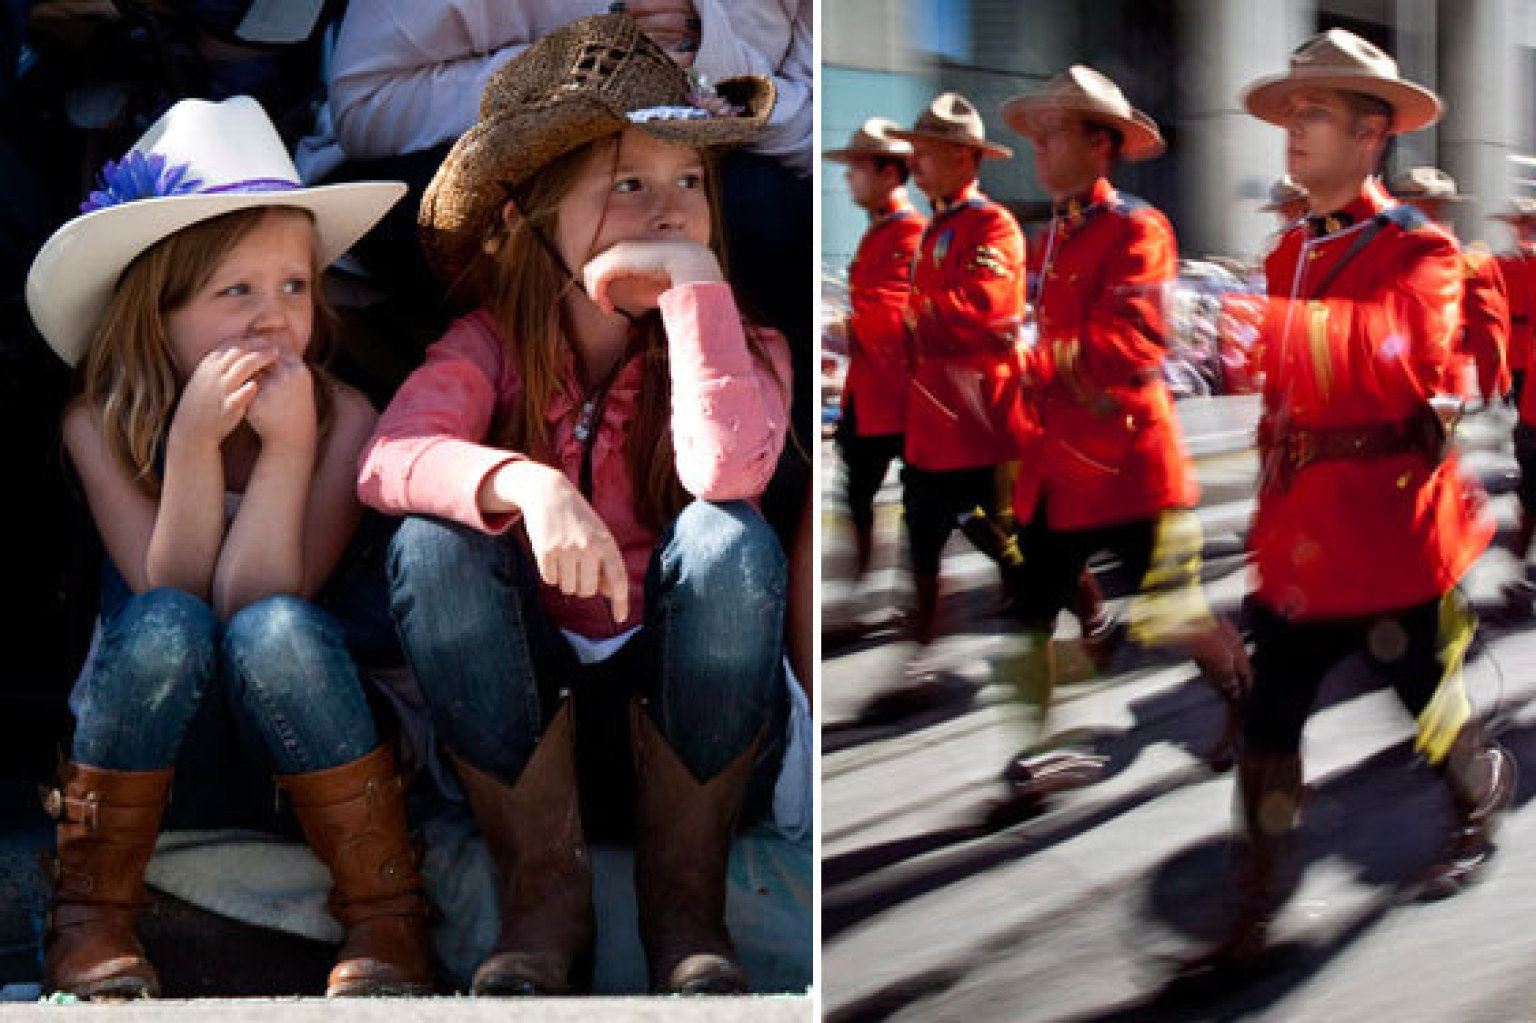 Calgary Stampede Parade 2013 Kicks Off 101 Years Of